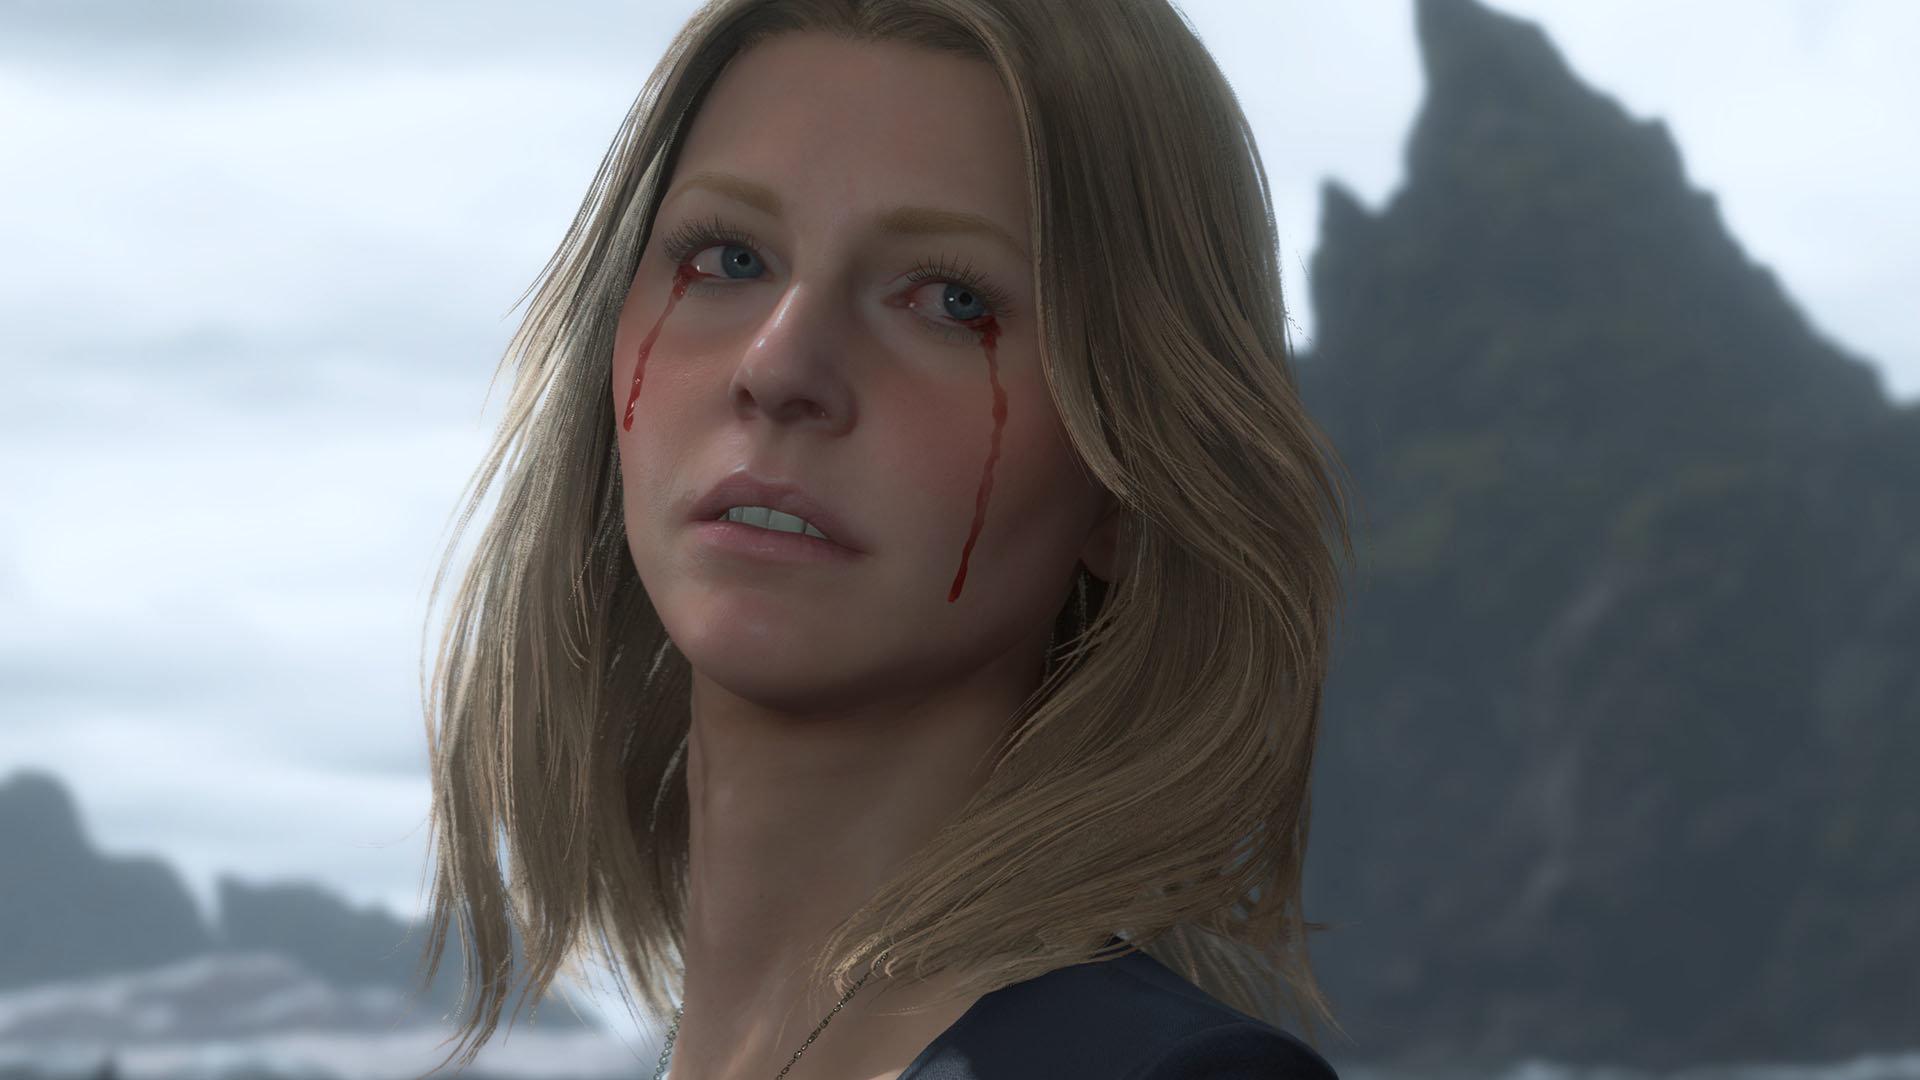 Szene aus dem Spiel Death Stranding